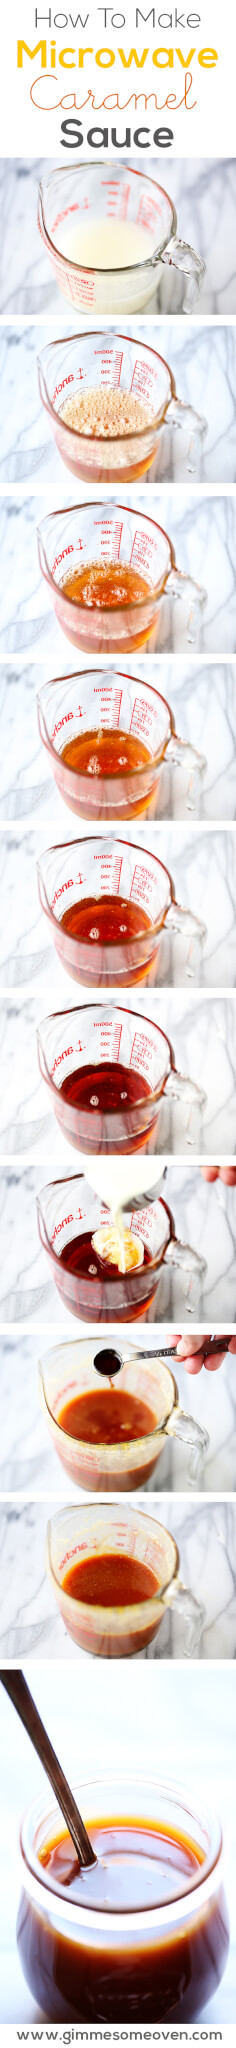 Microwave Caramel Sauce | gimmesomeoven.com